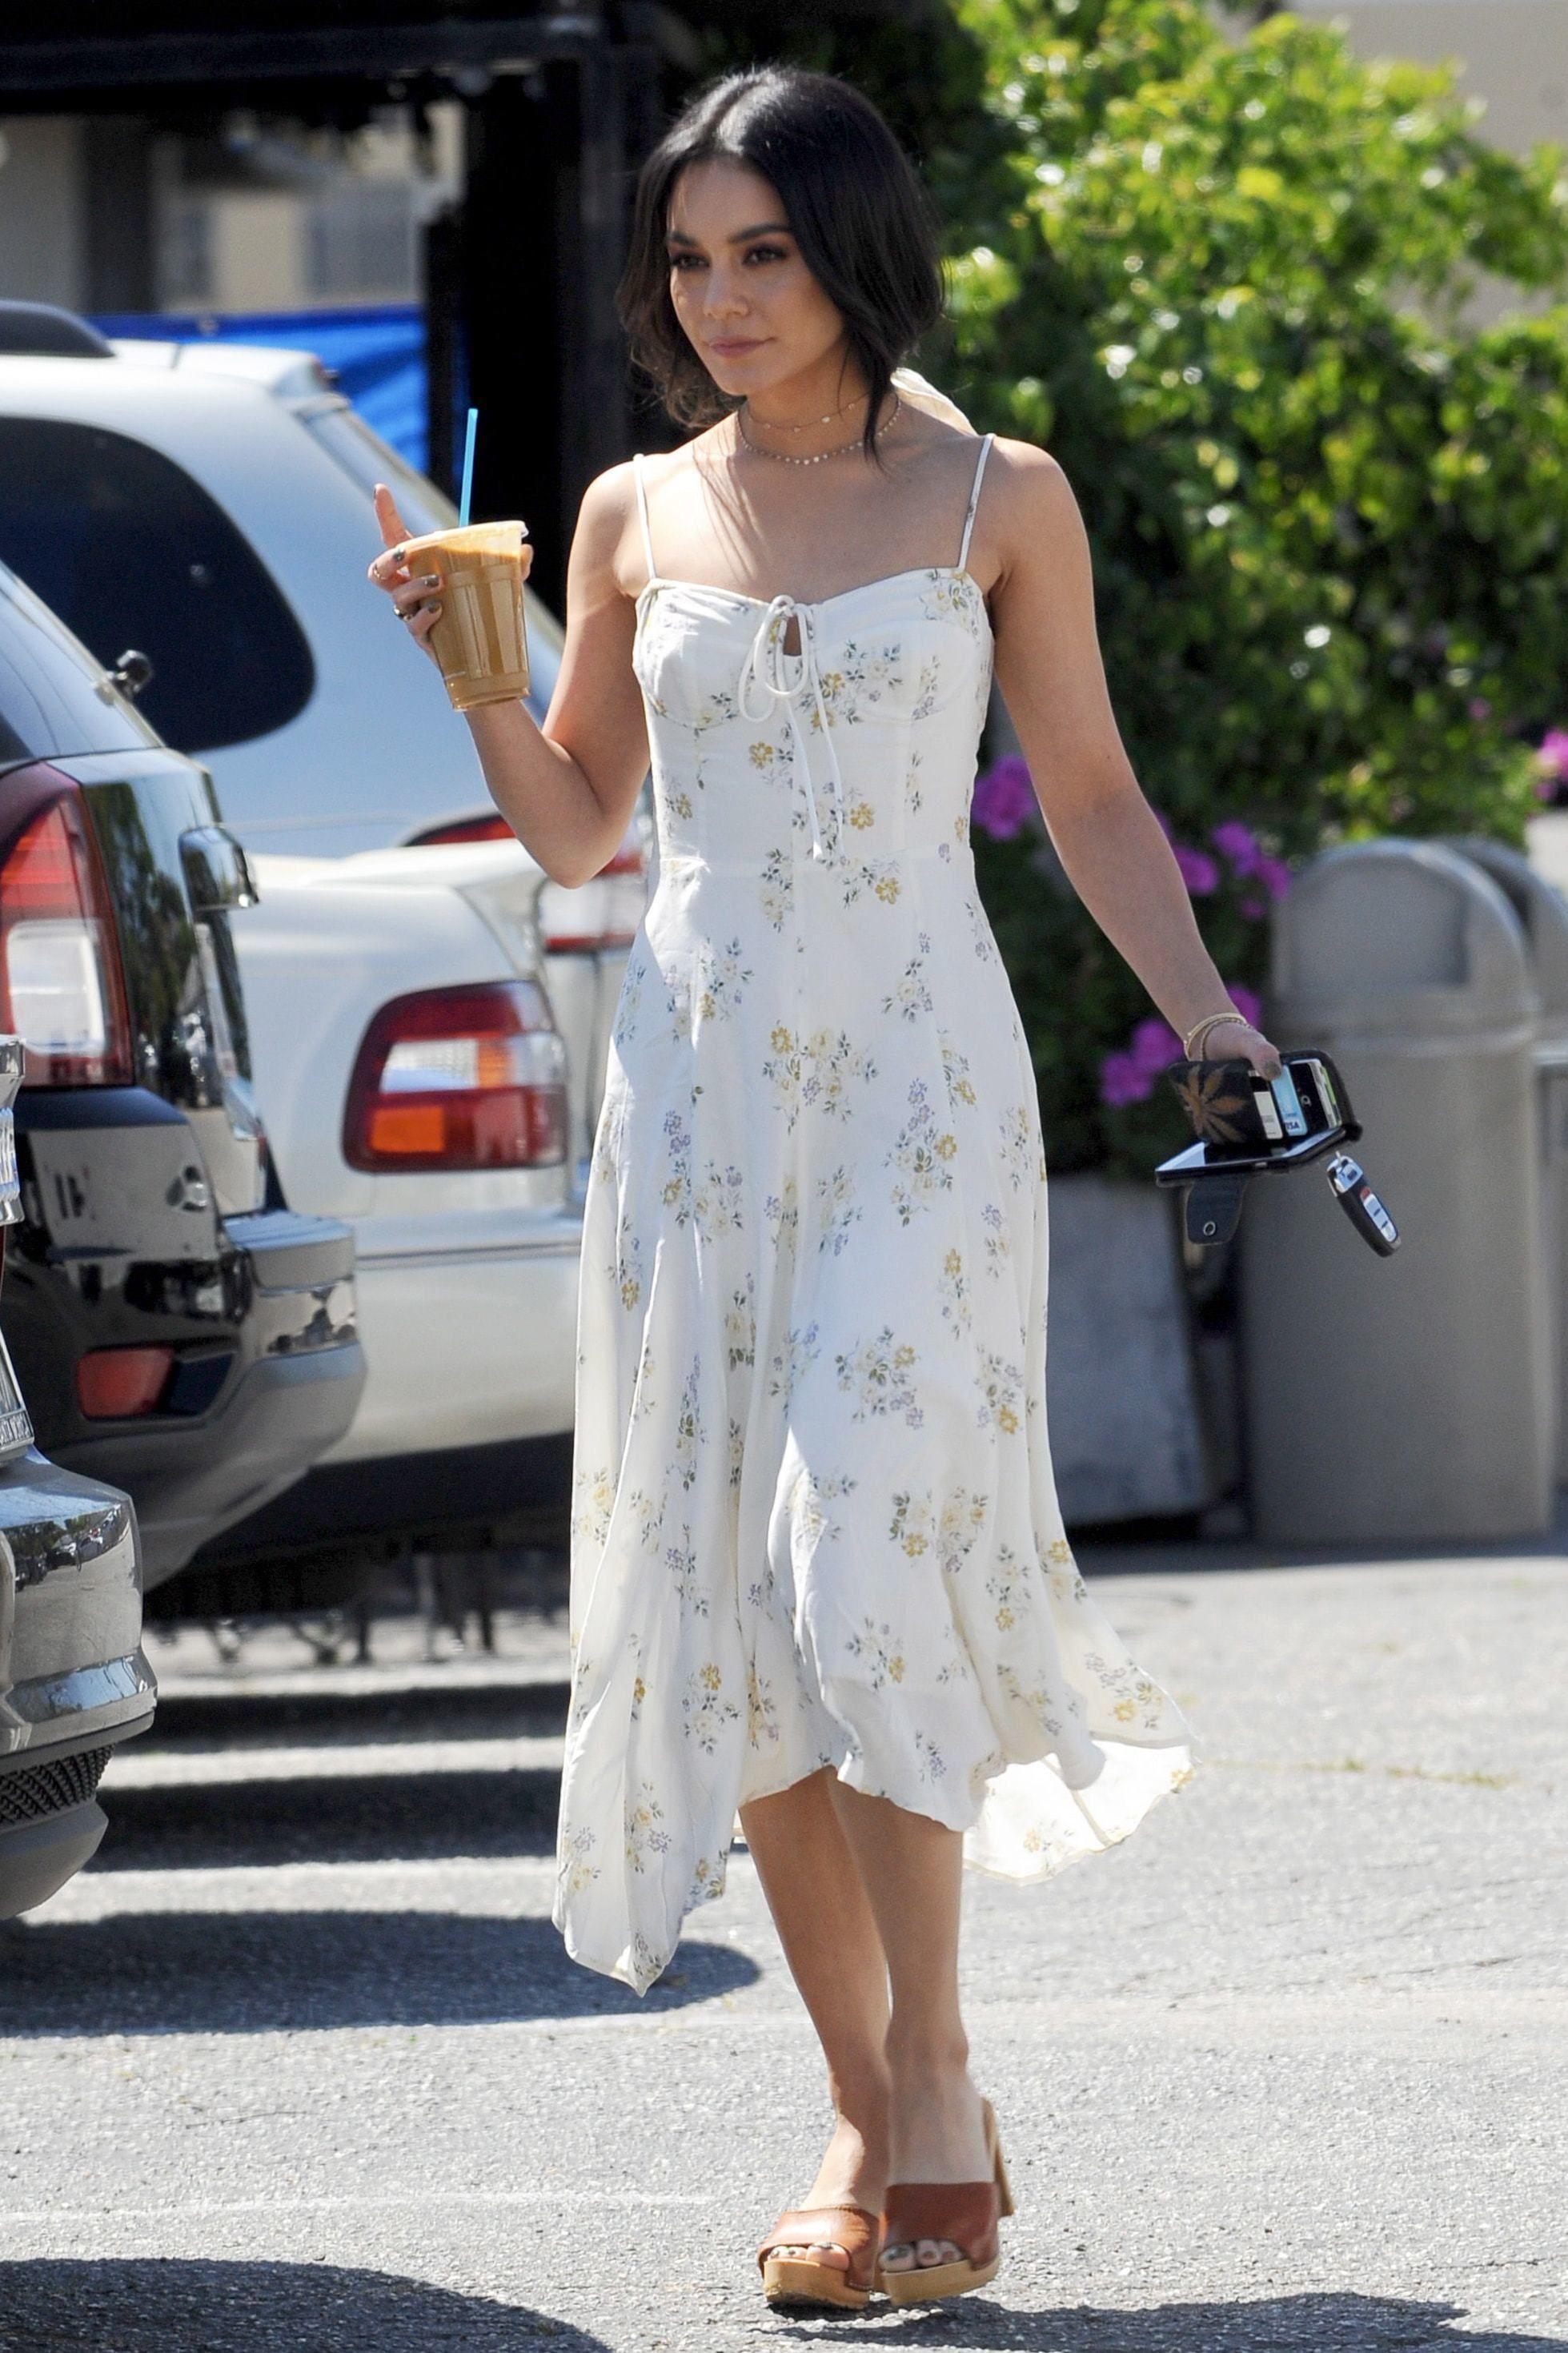 Dress – Wheretoget